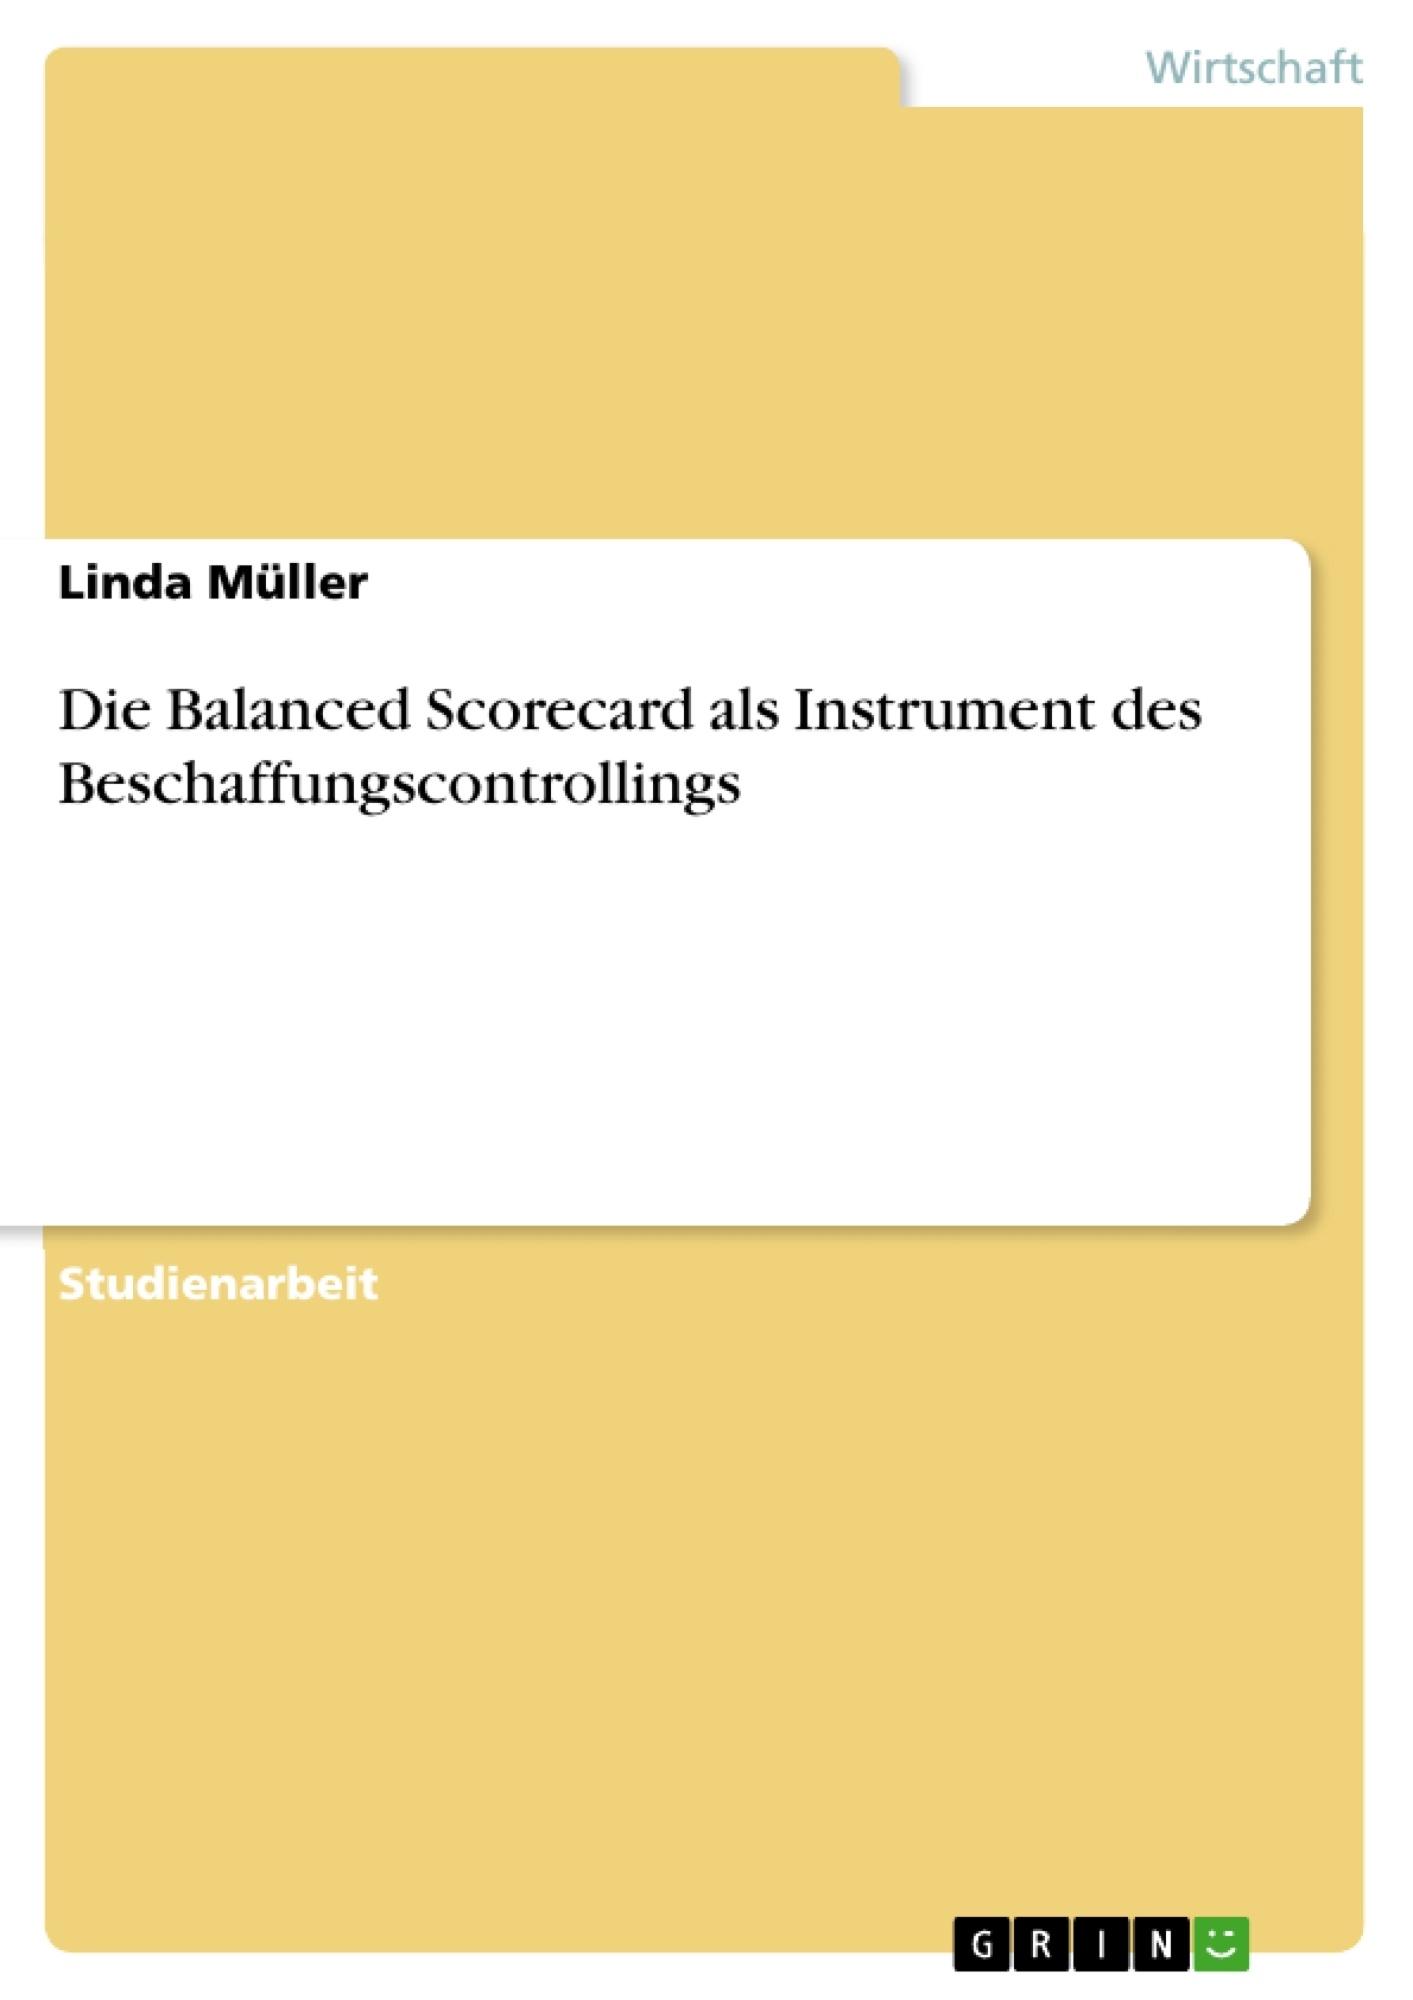 Titel: Die Balanced Scorecard als Instrument des  Beschaffungscontrollings